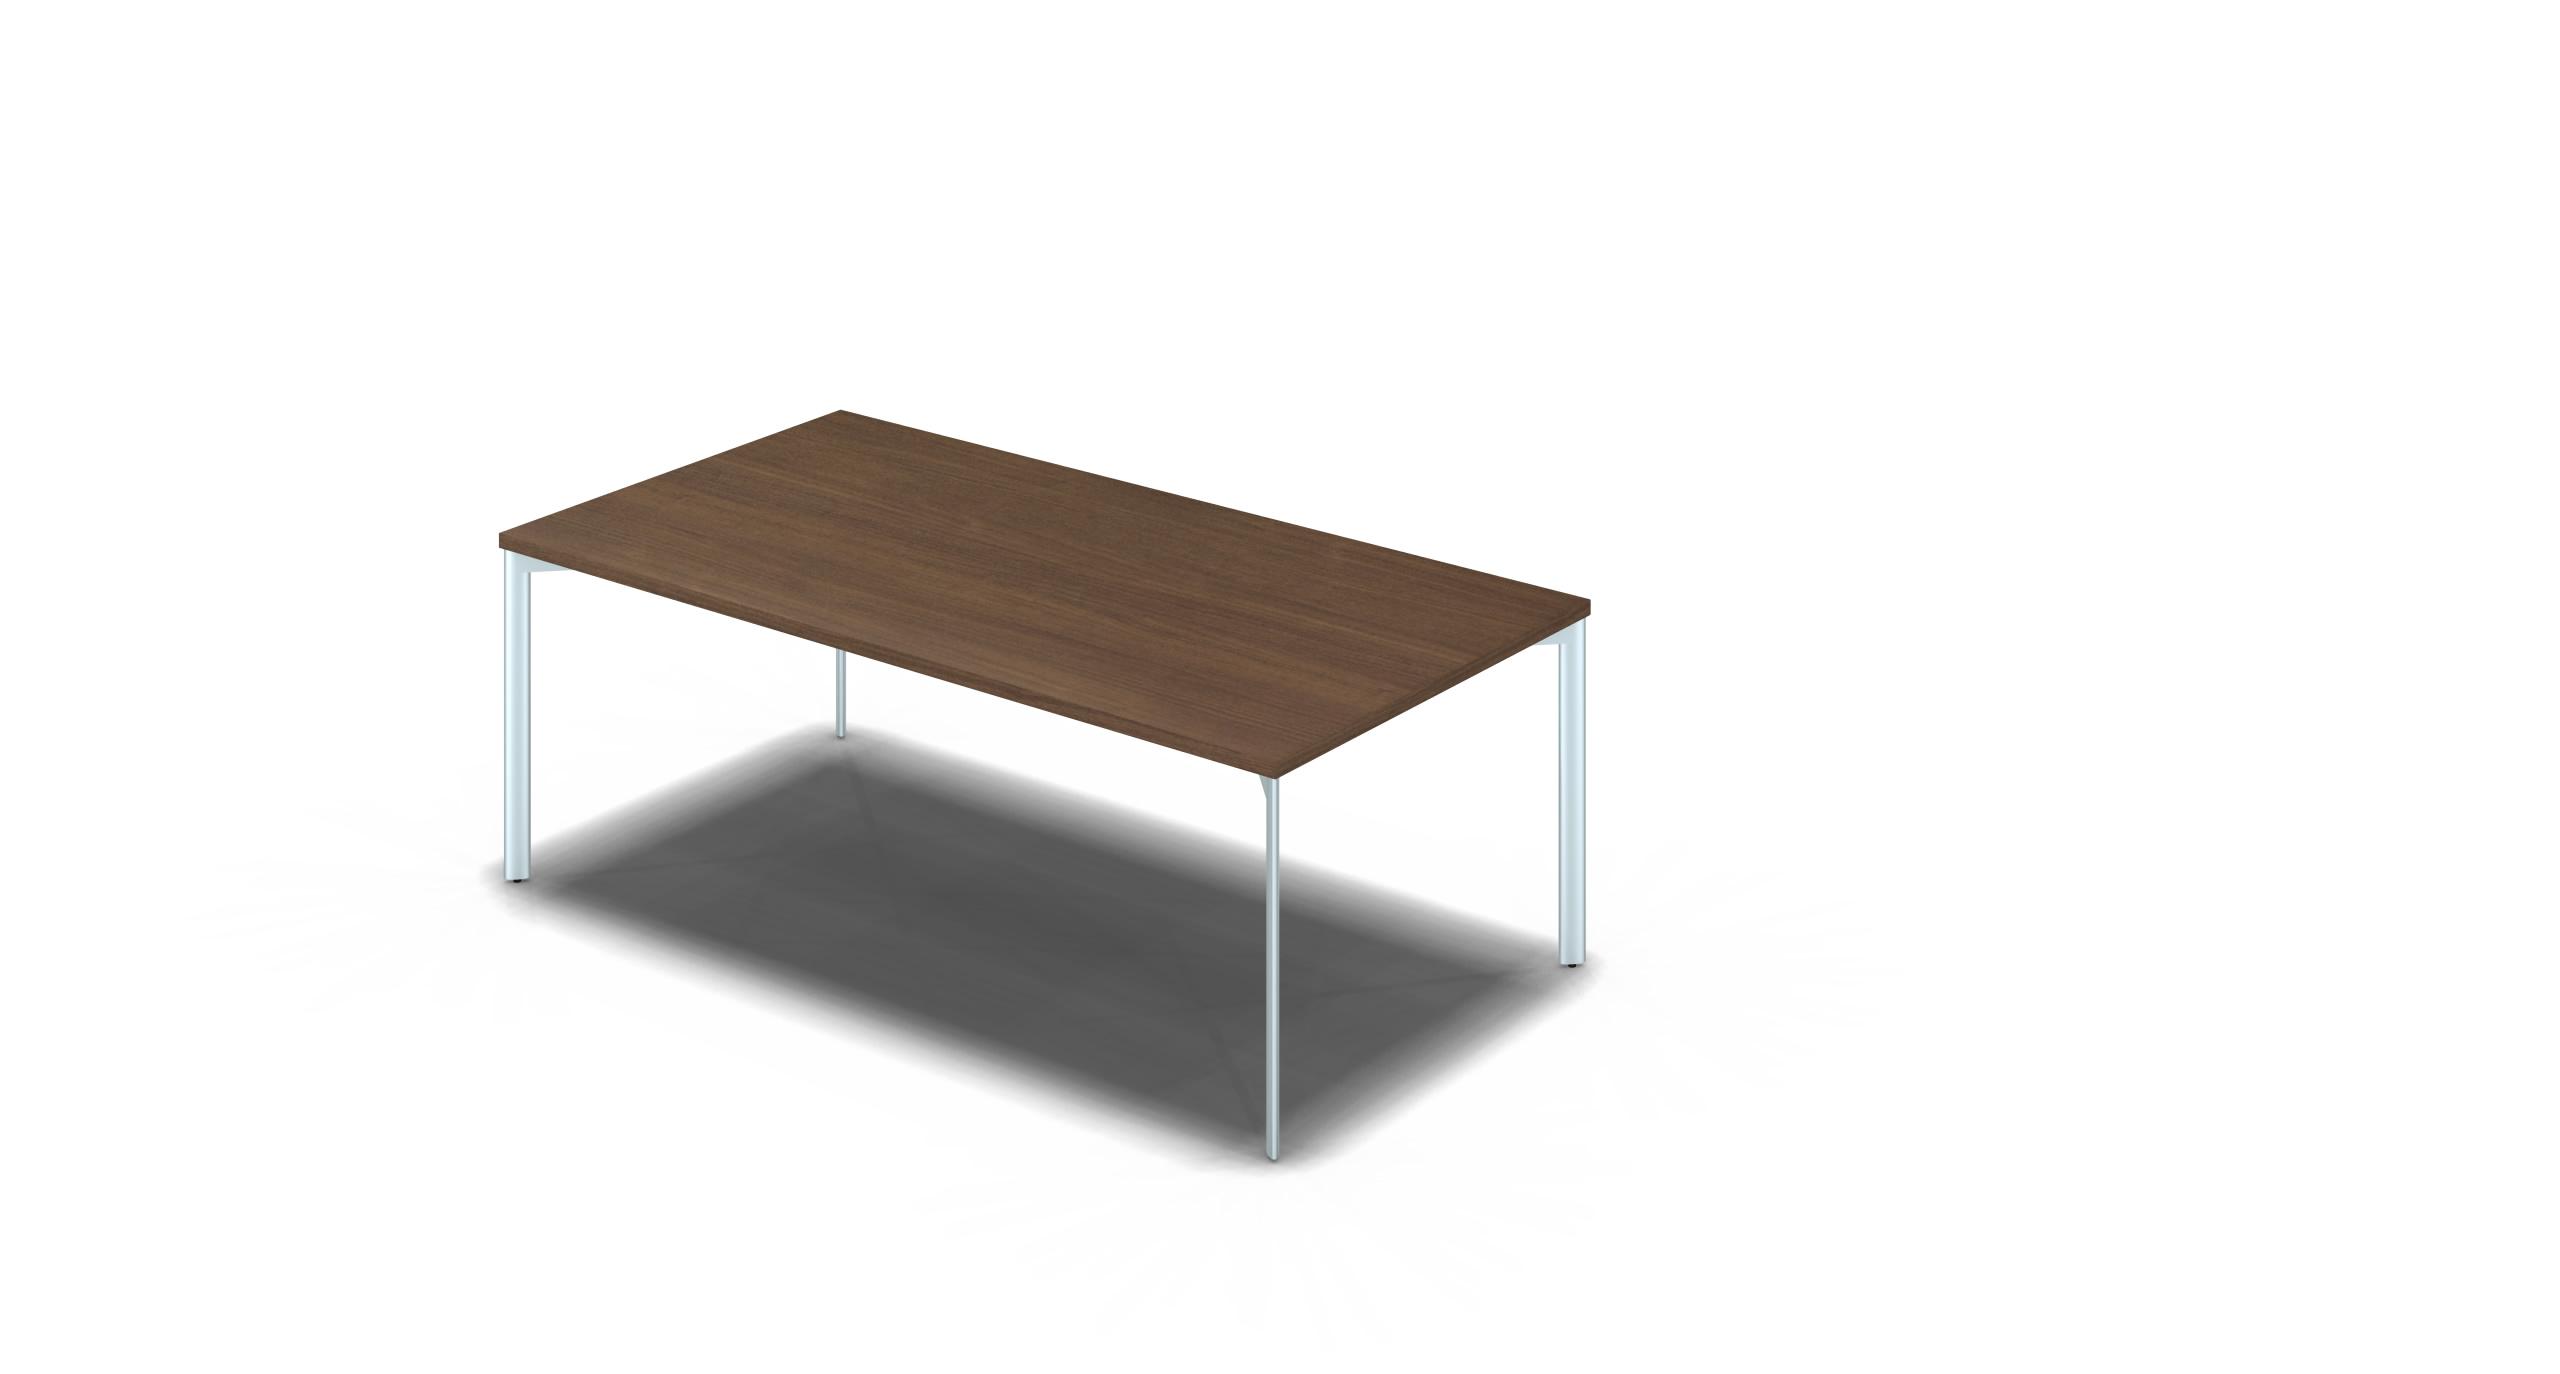 Table_Slim_1800x900_Silver_Walnut_noOption